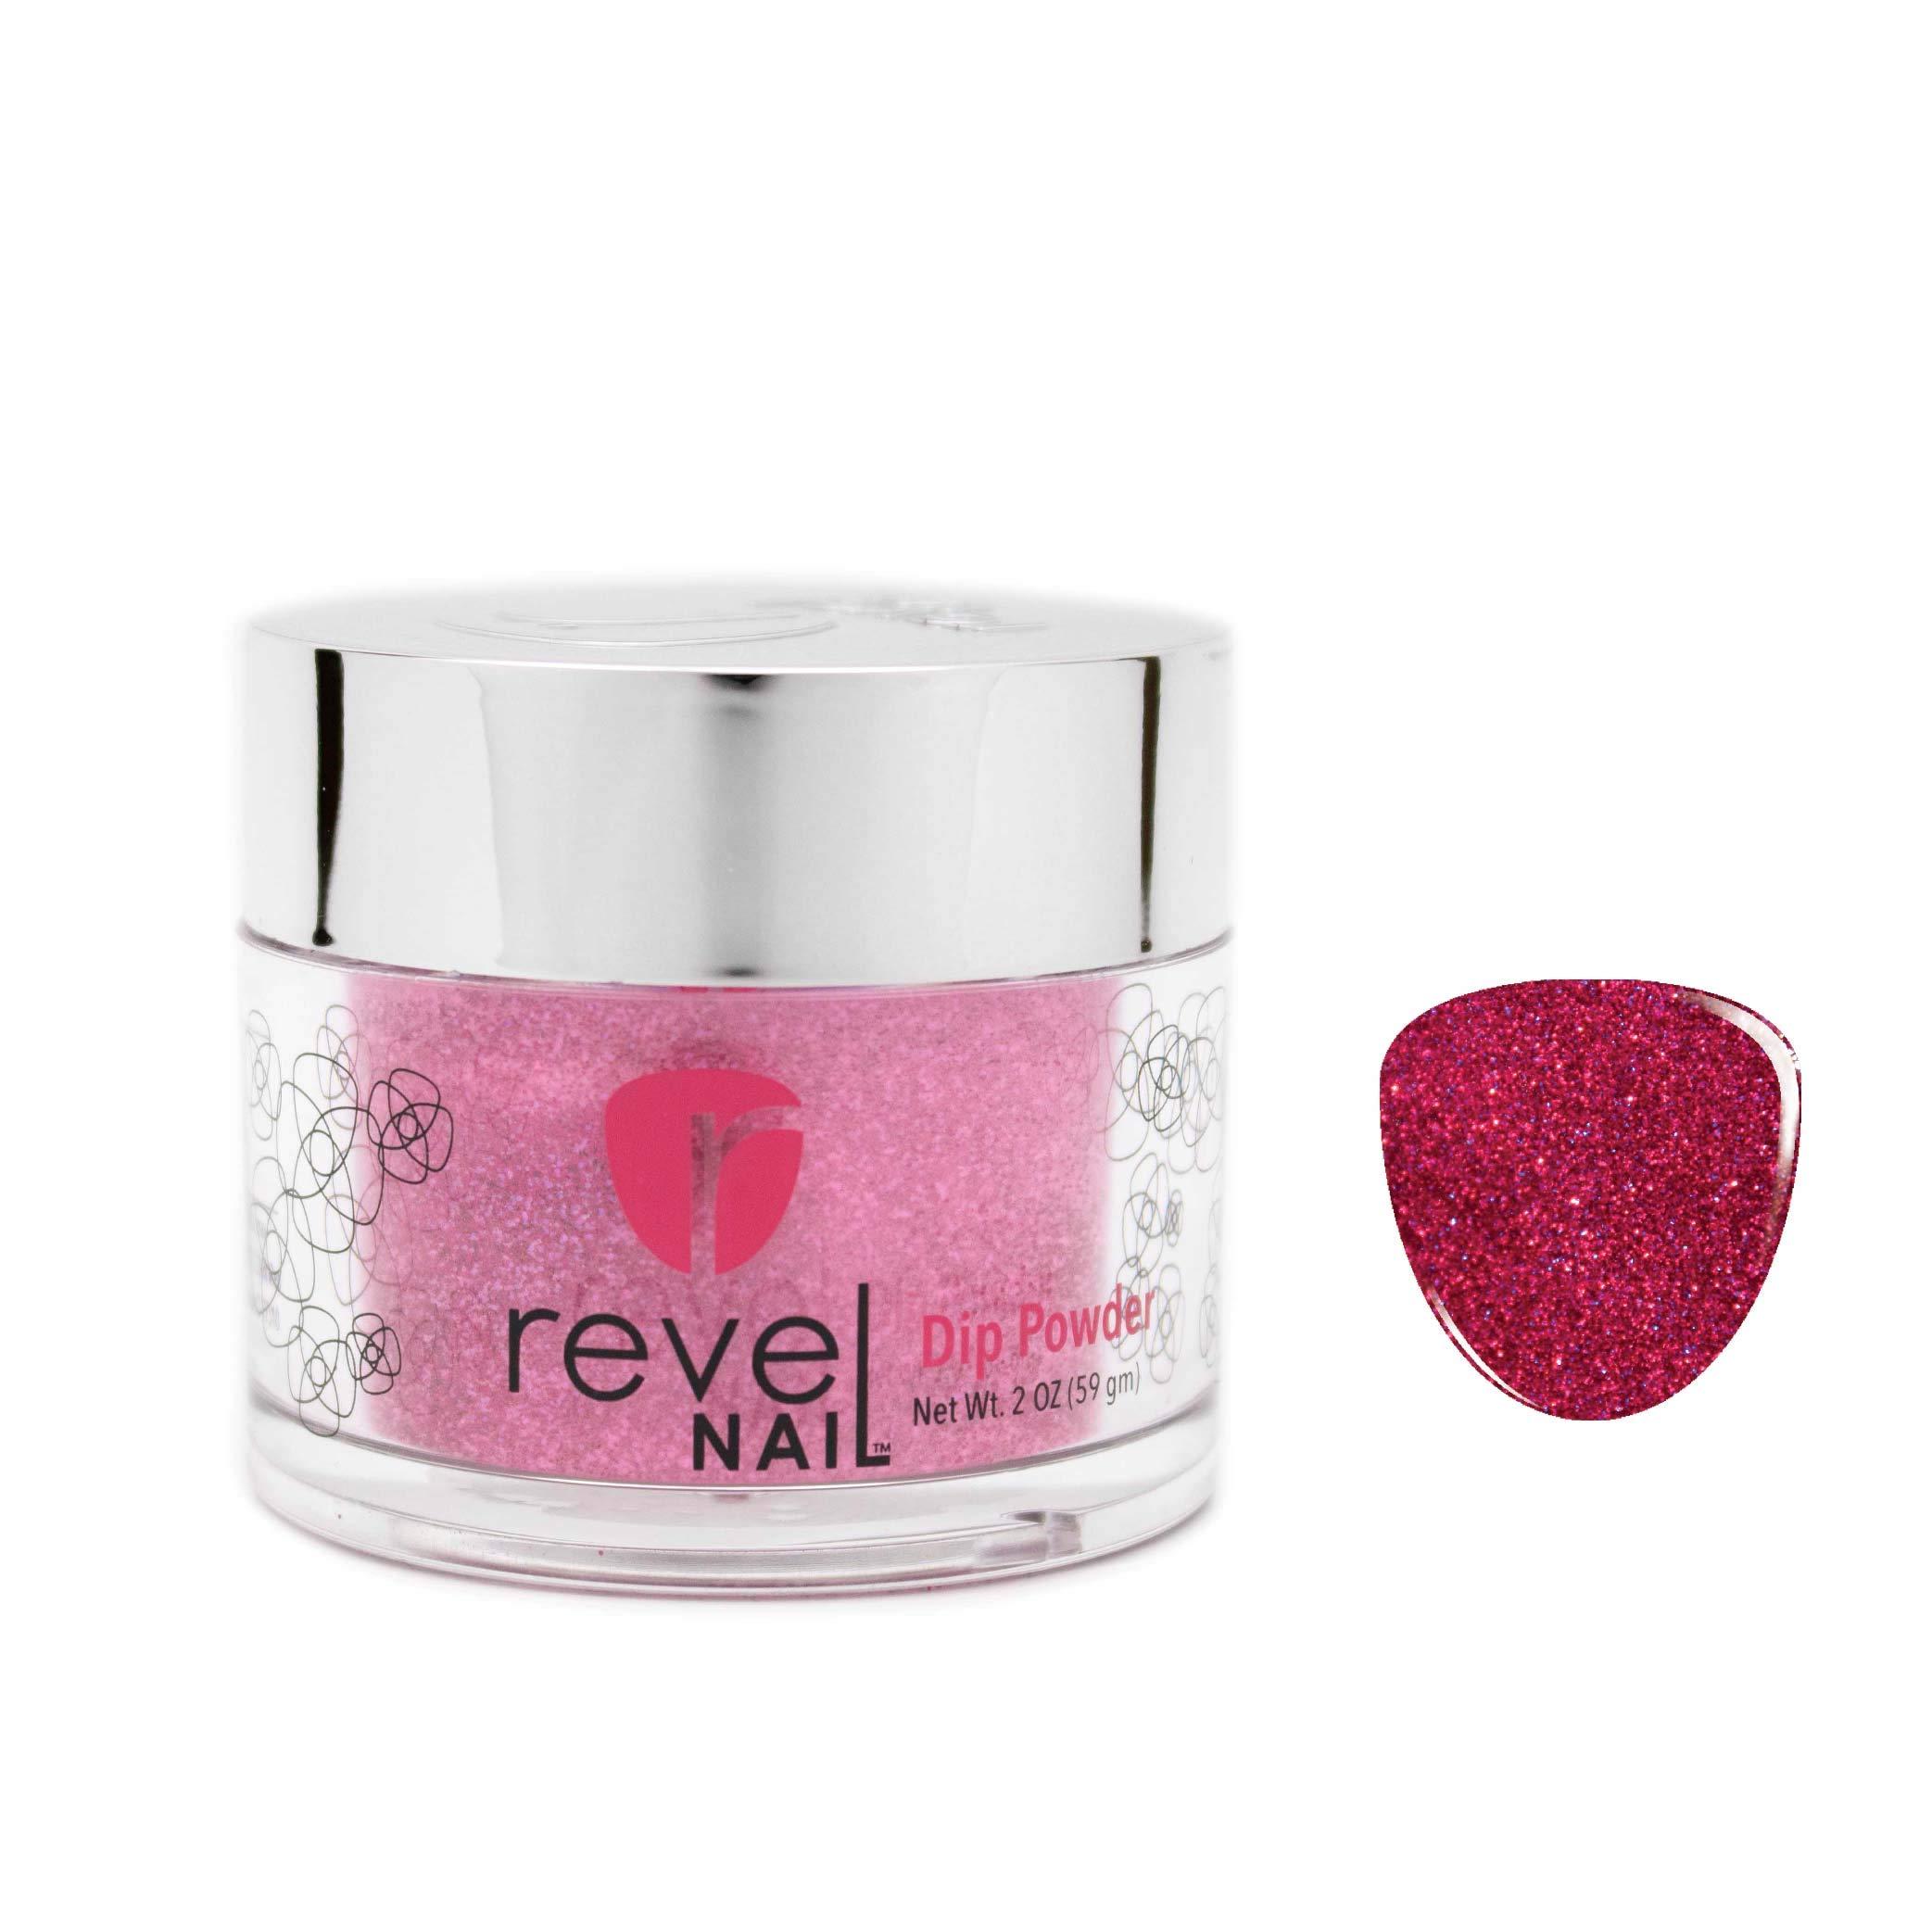 Revel Nail Dip Powder Glitter Colors Miracle 2 Ounces